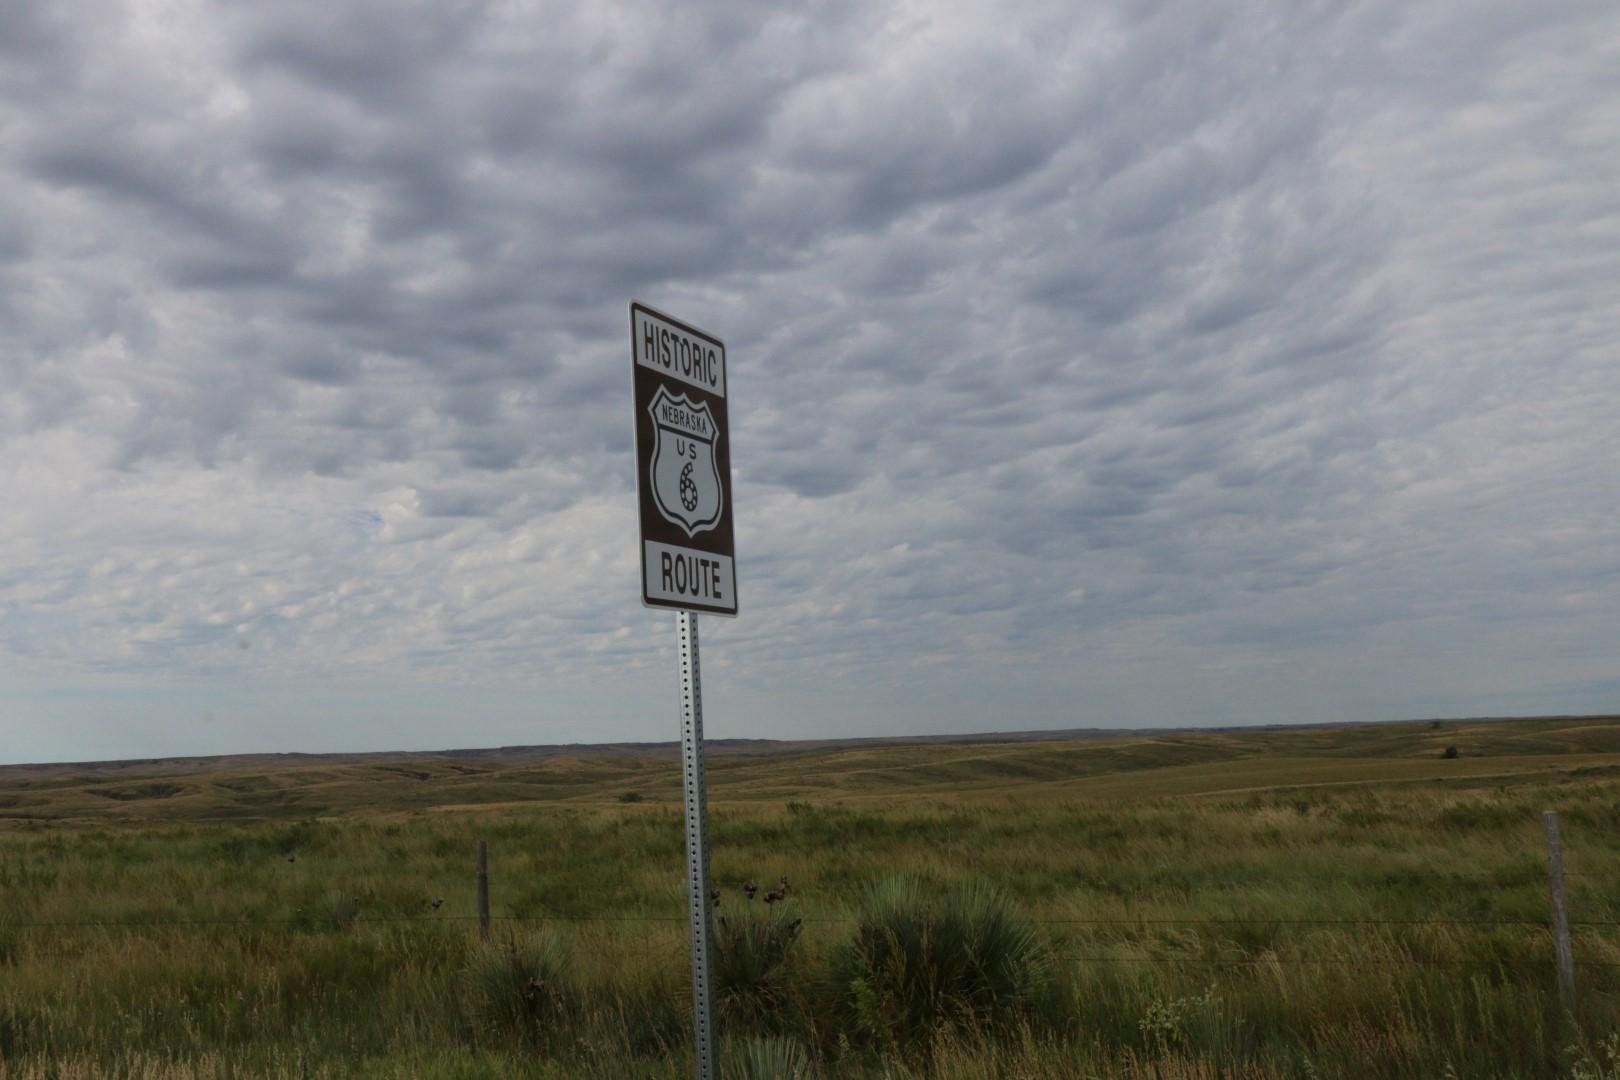 Historic Route 6